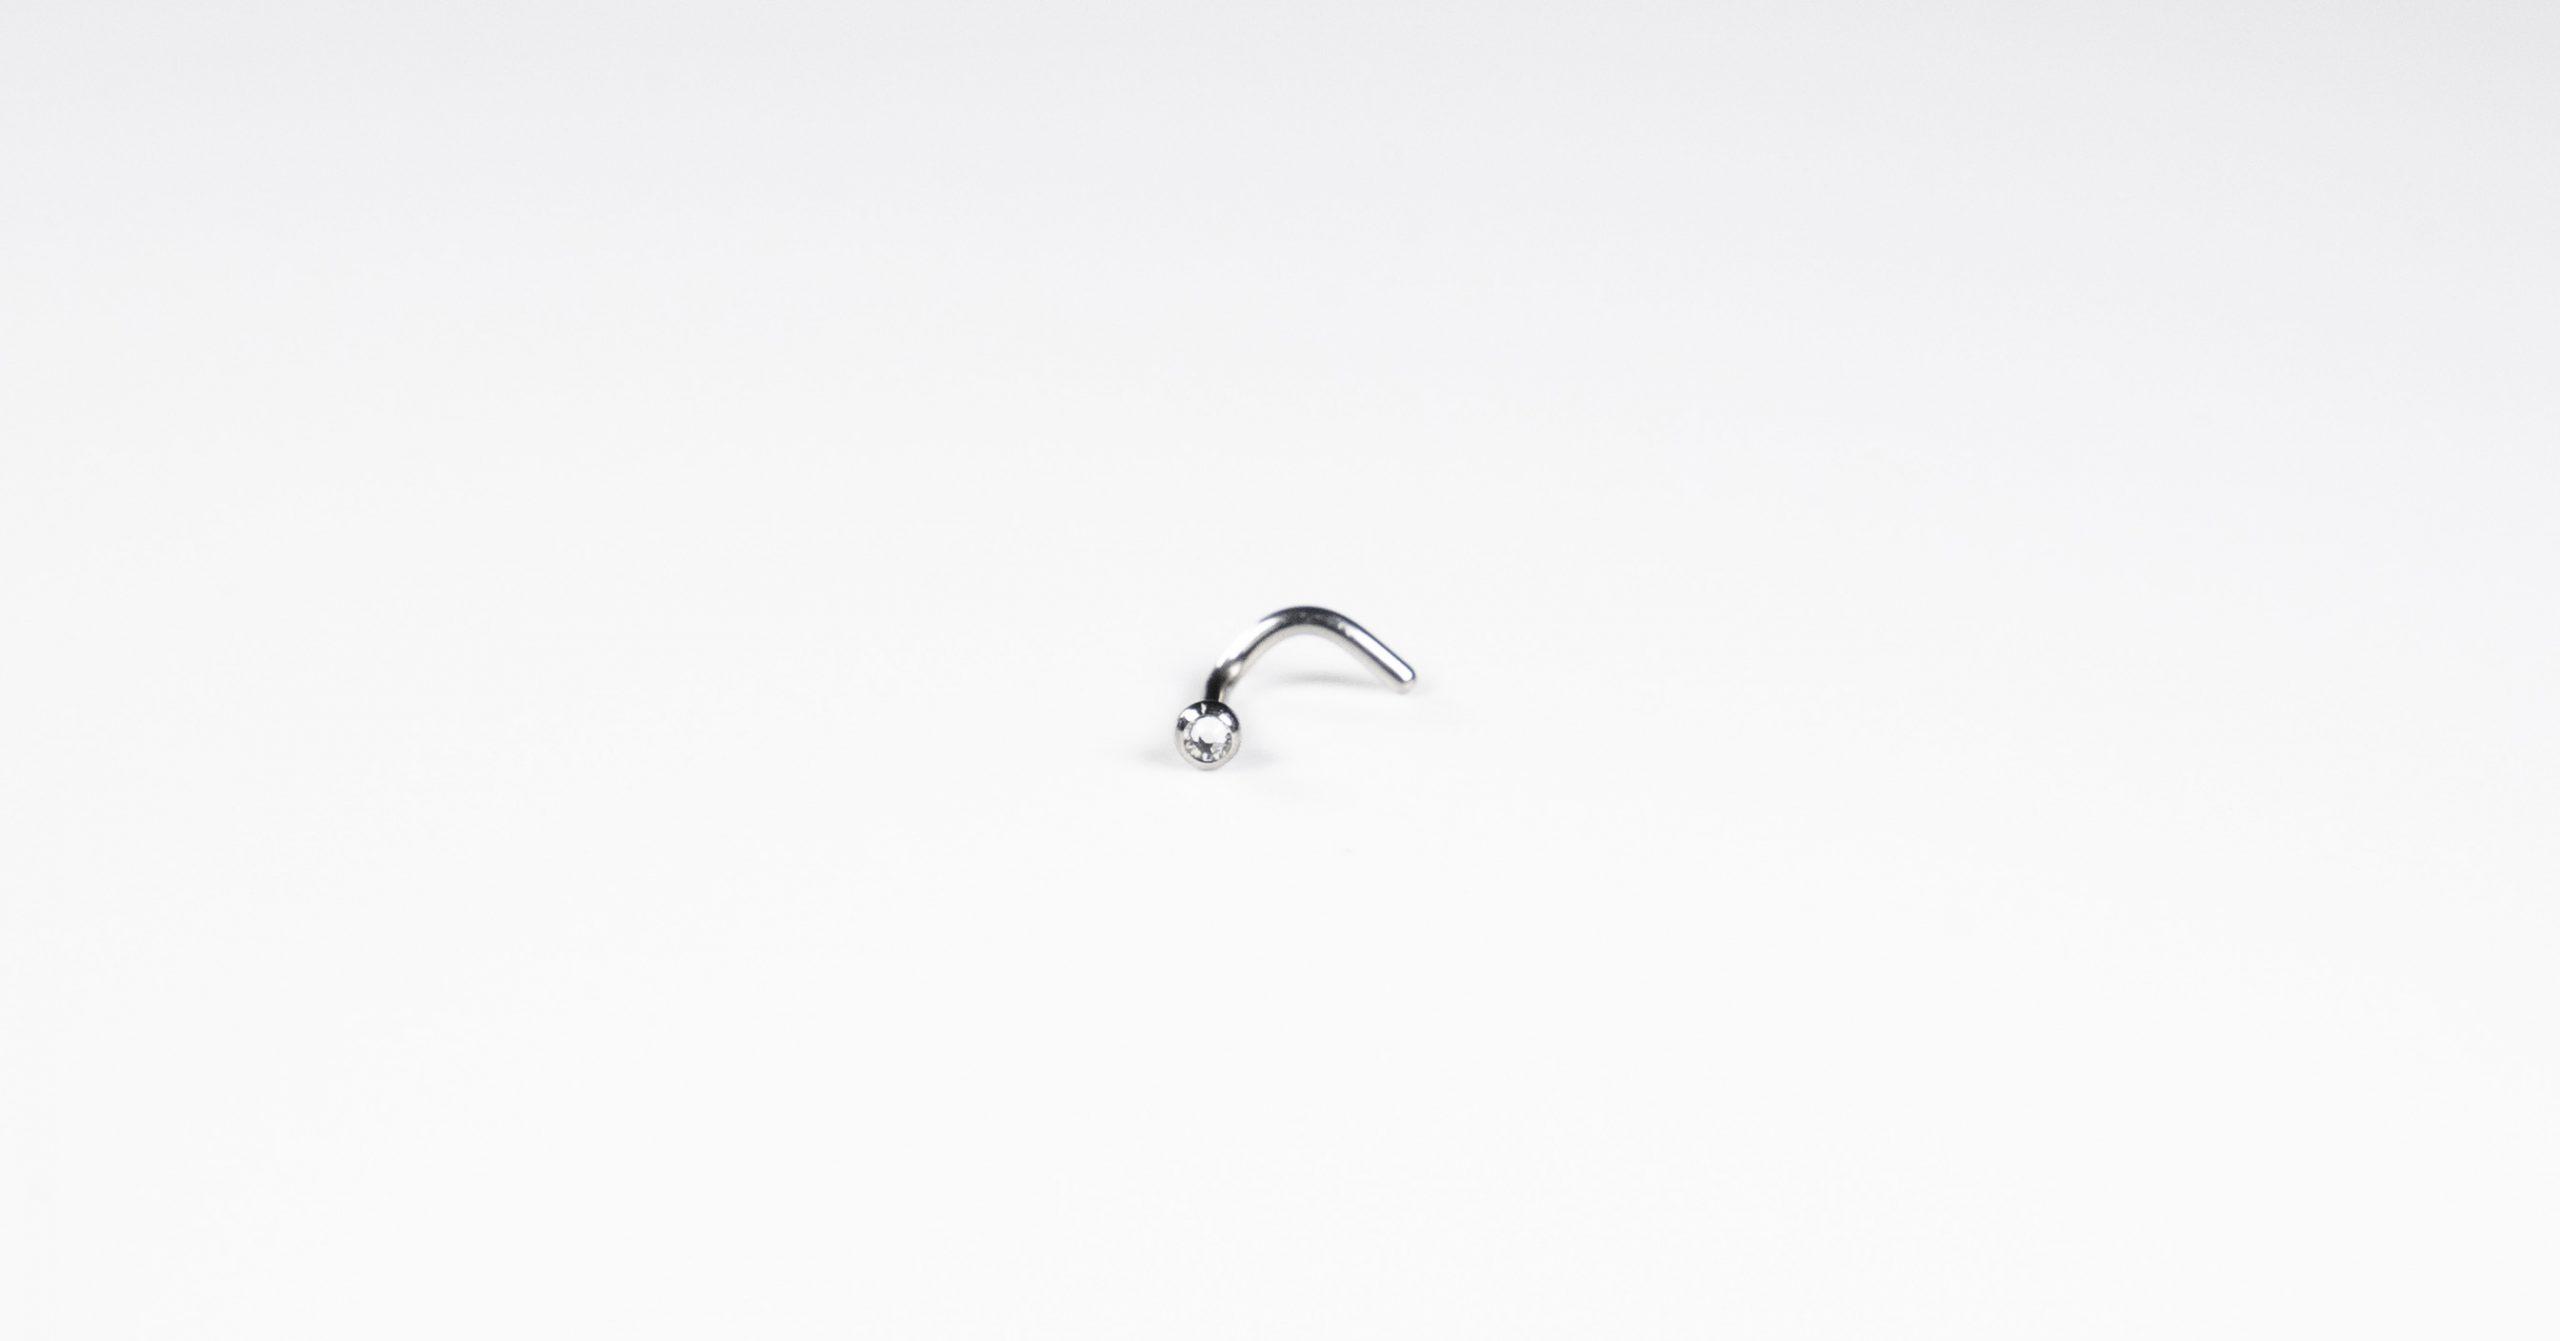 Jewelled Nose Stud - Bella Andrea London (1)